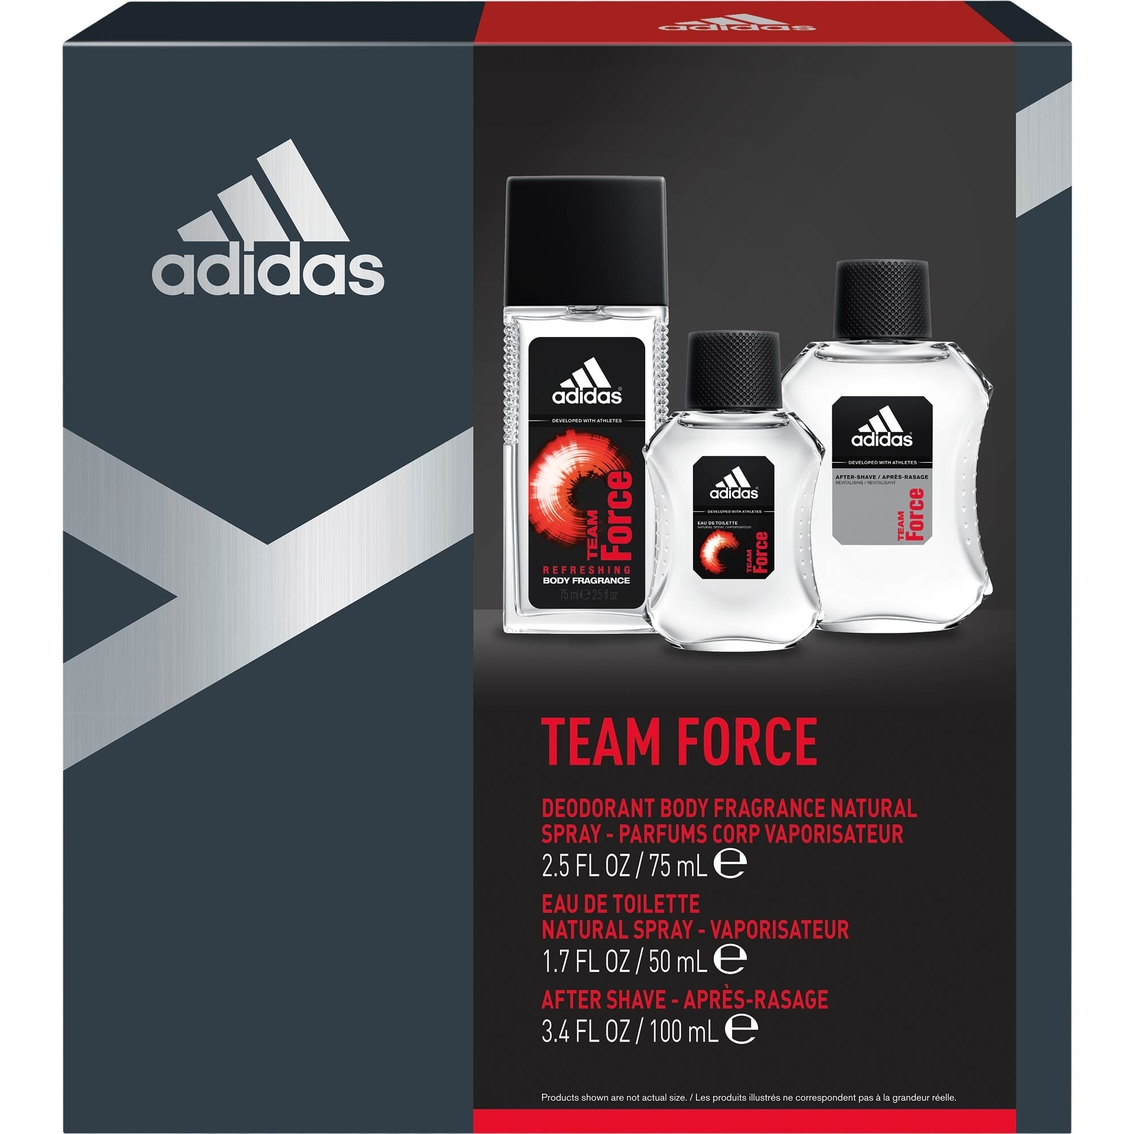 ee62beb5da5a Adidas Team Force Gift Set 3 Pc.